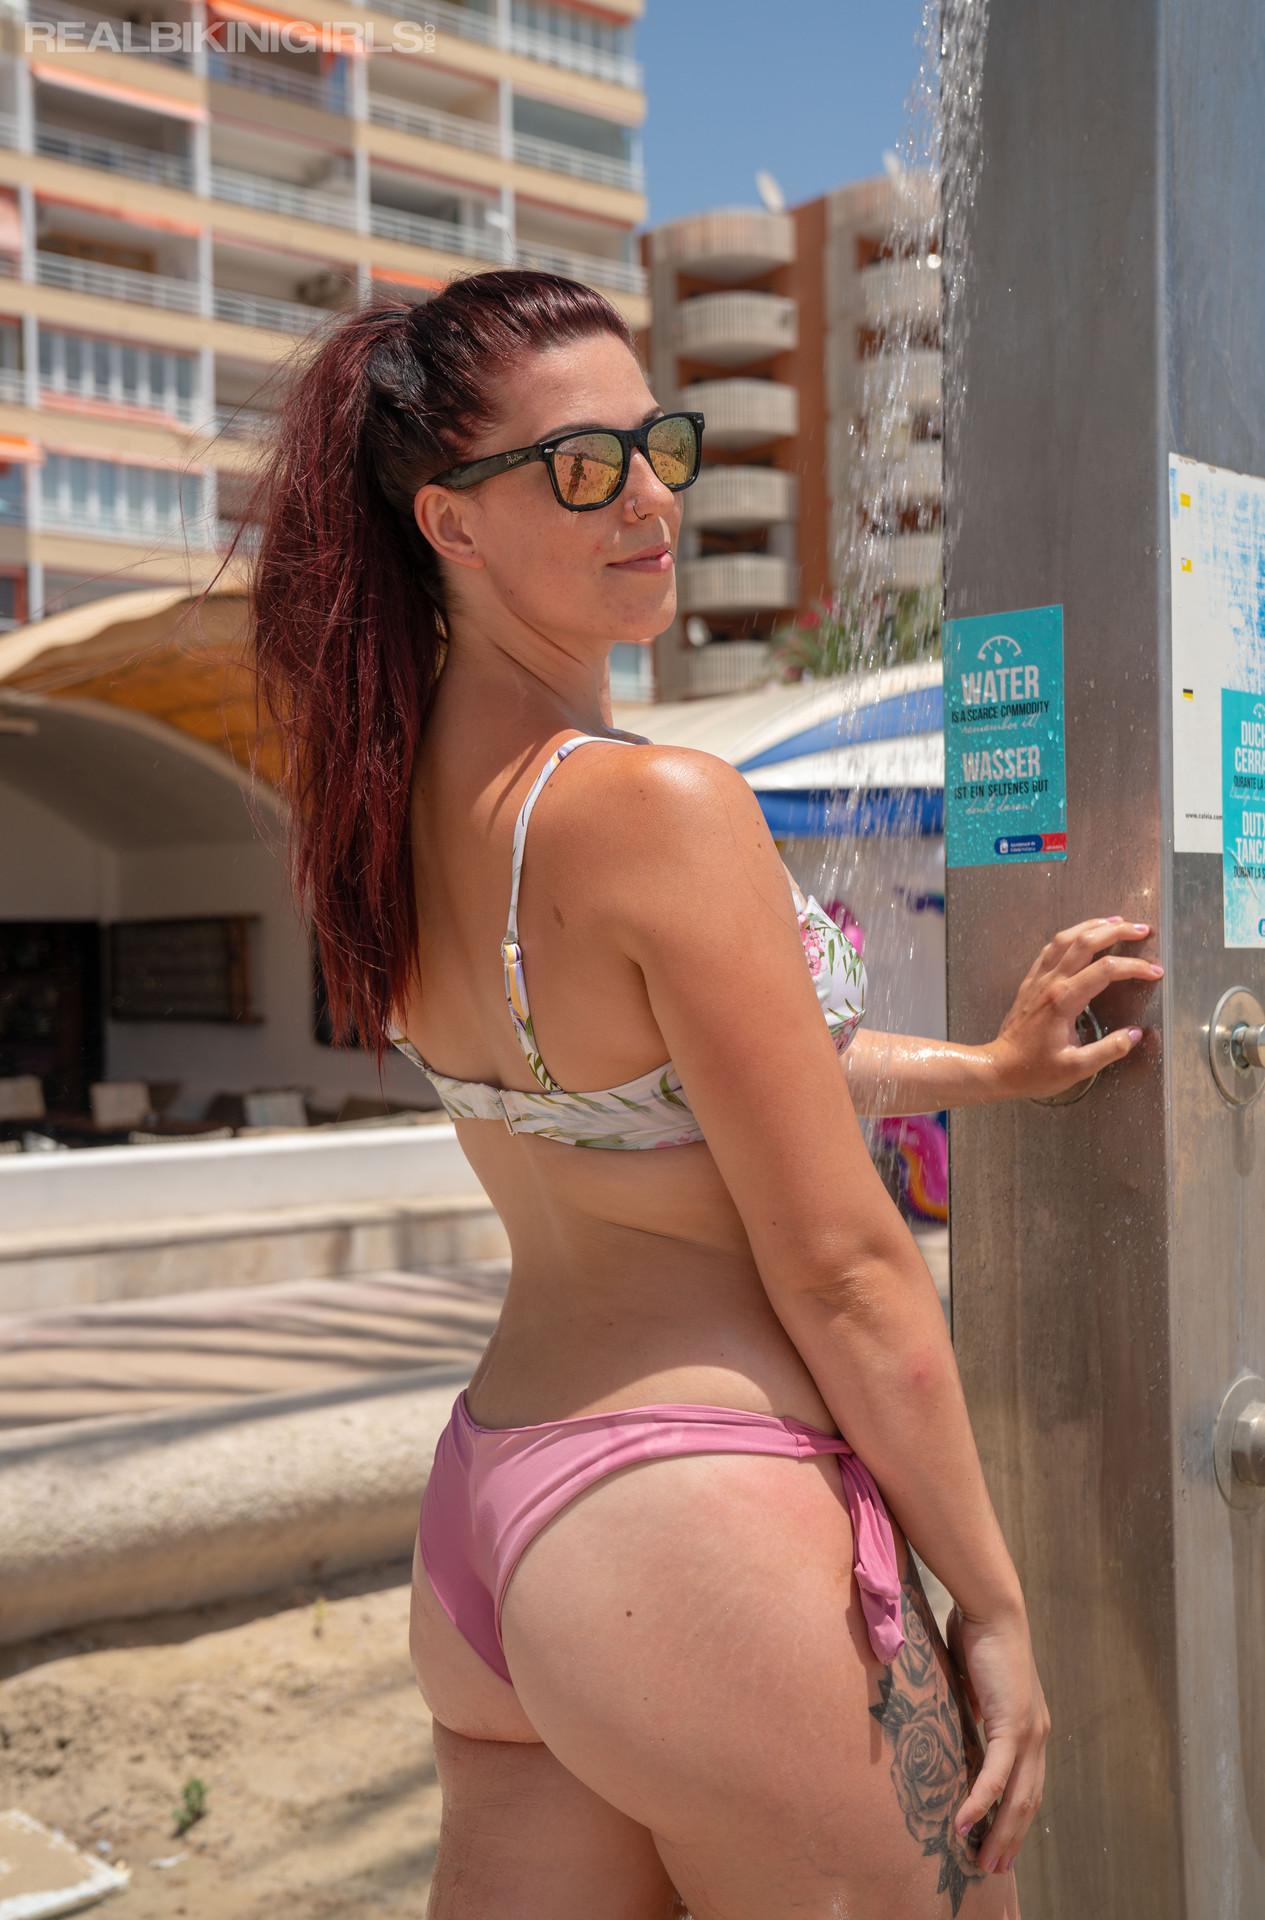 charlotte-public-shower-192